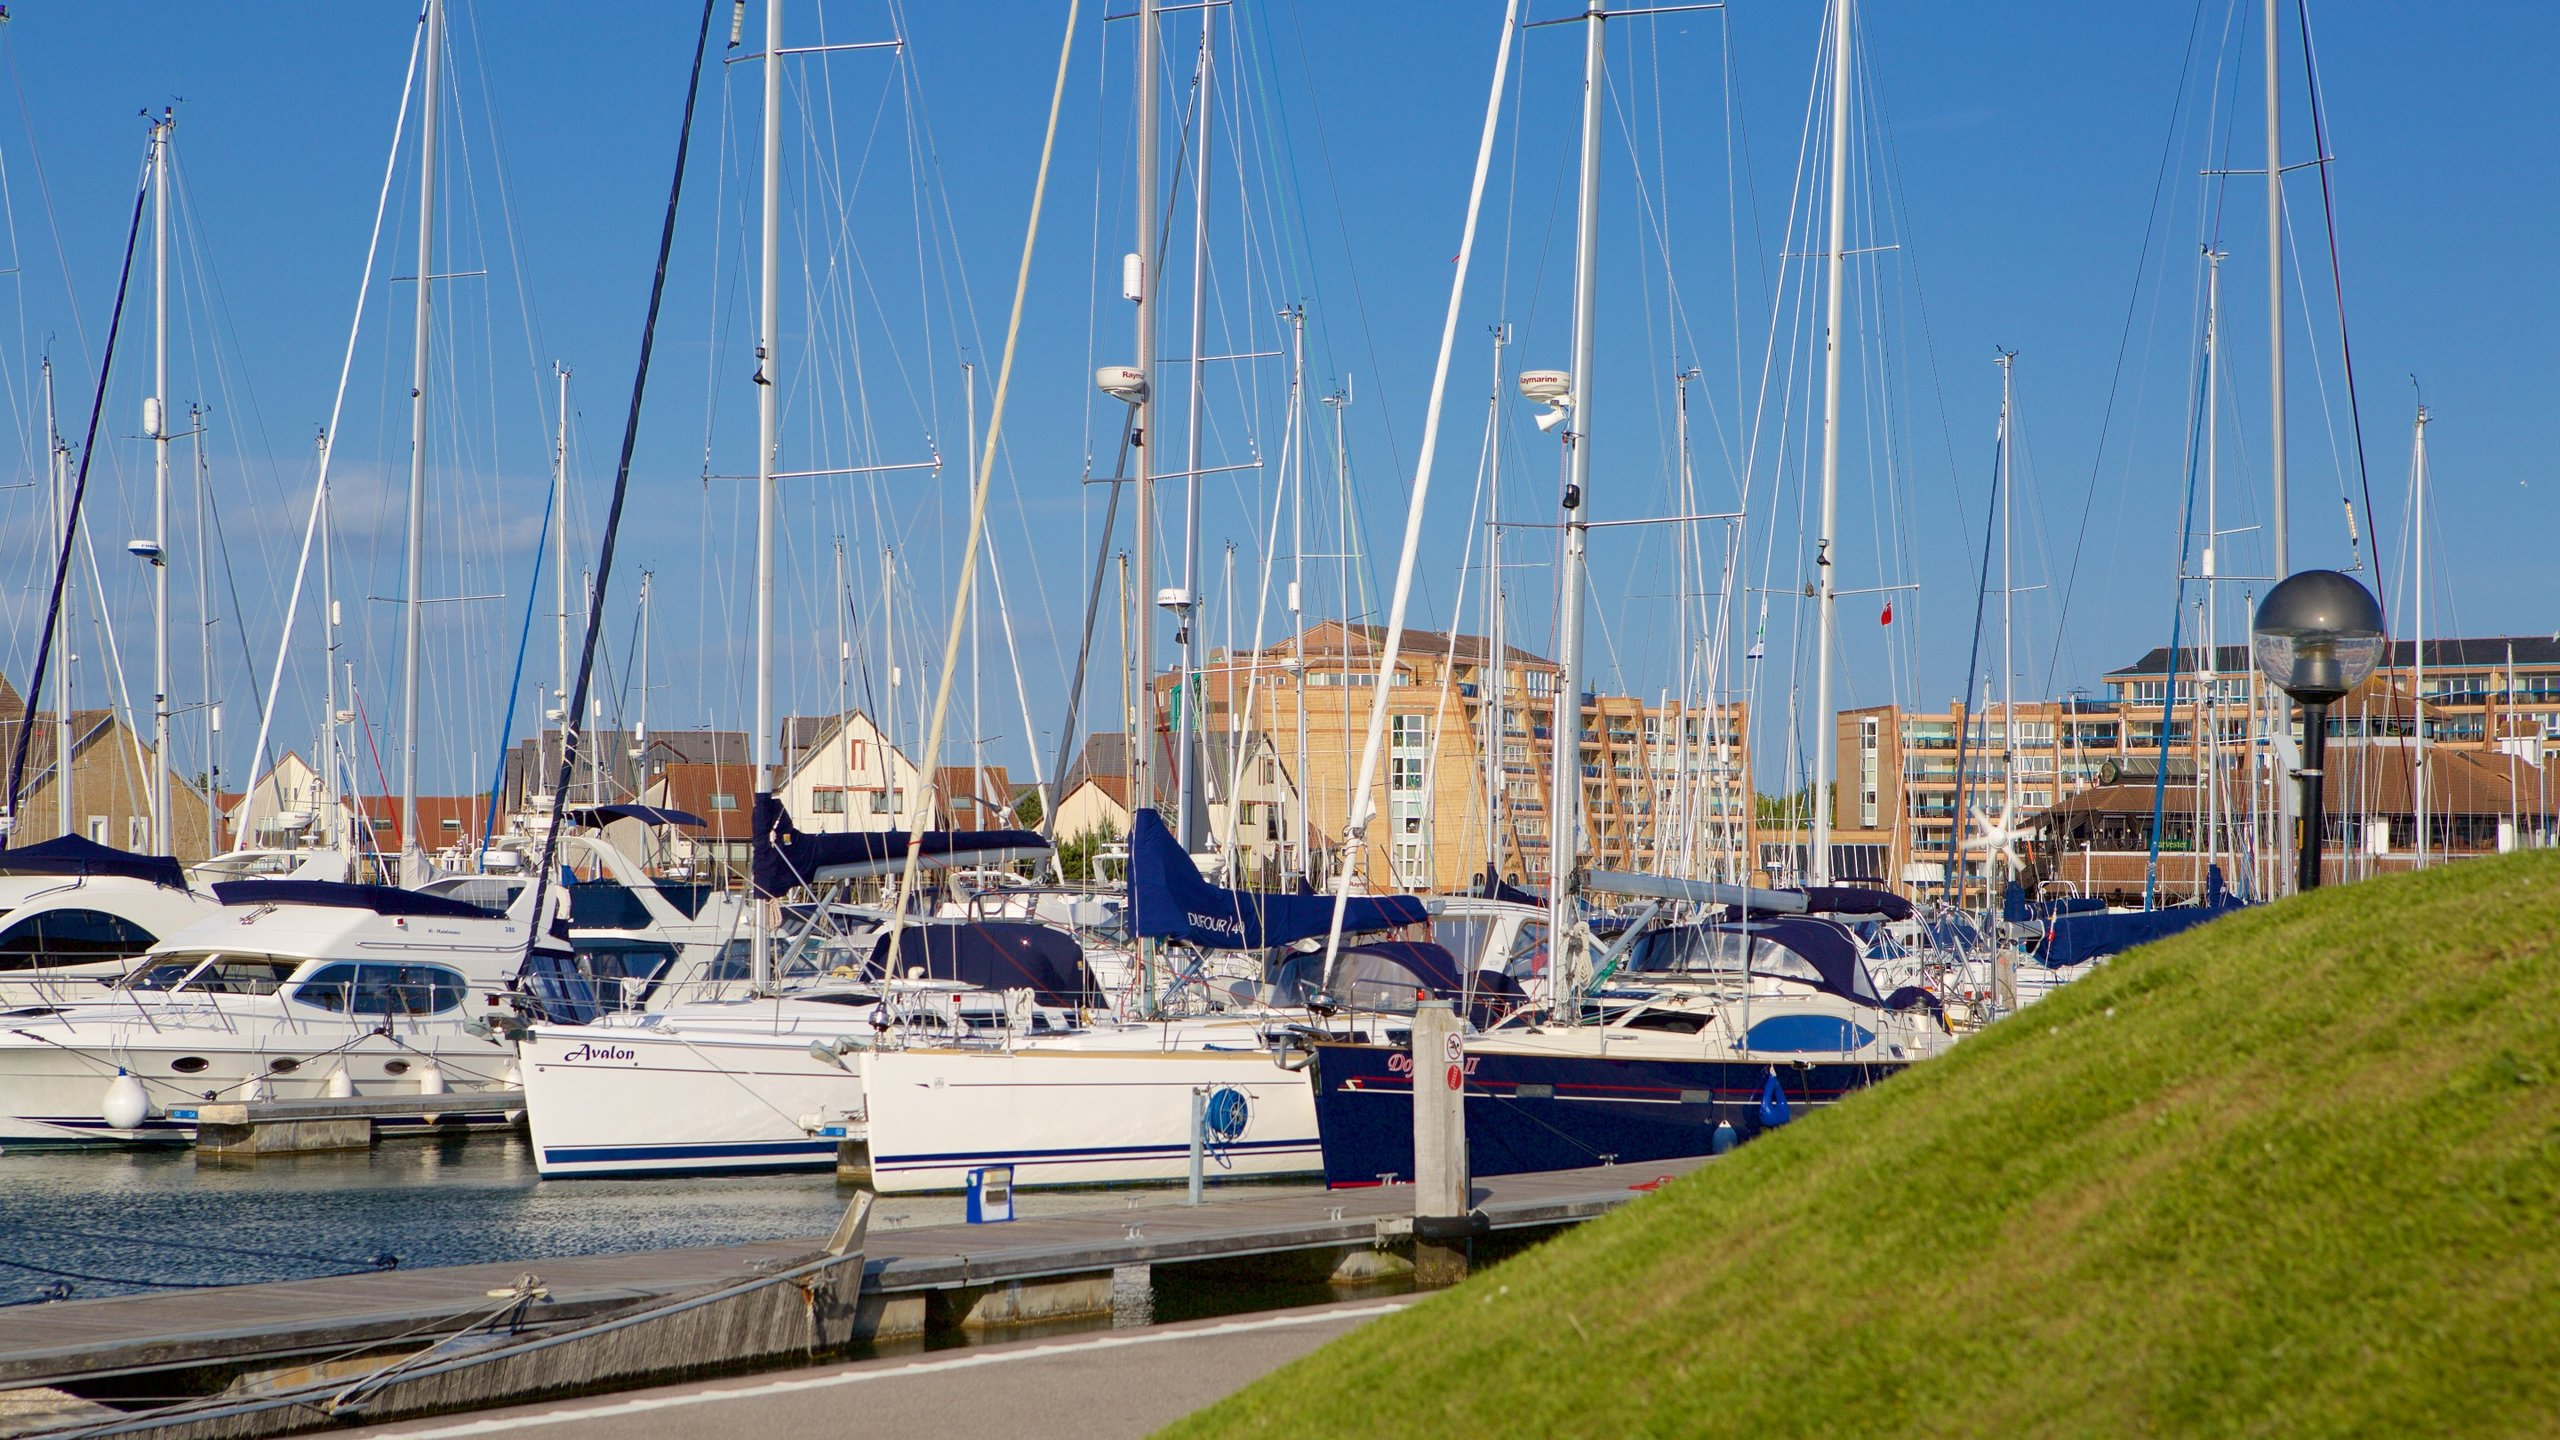 Portsmouth, England, United Kingdom